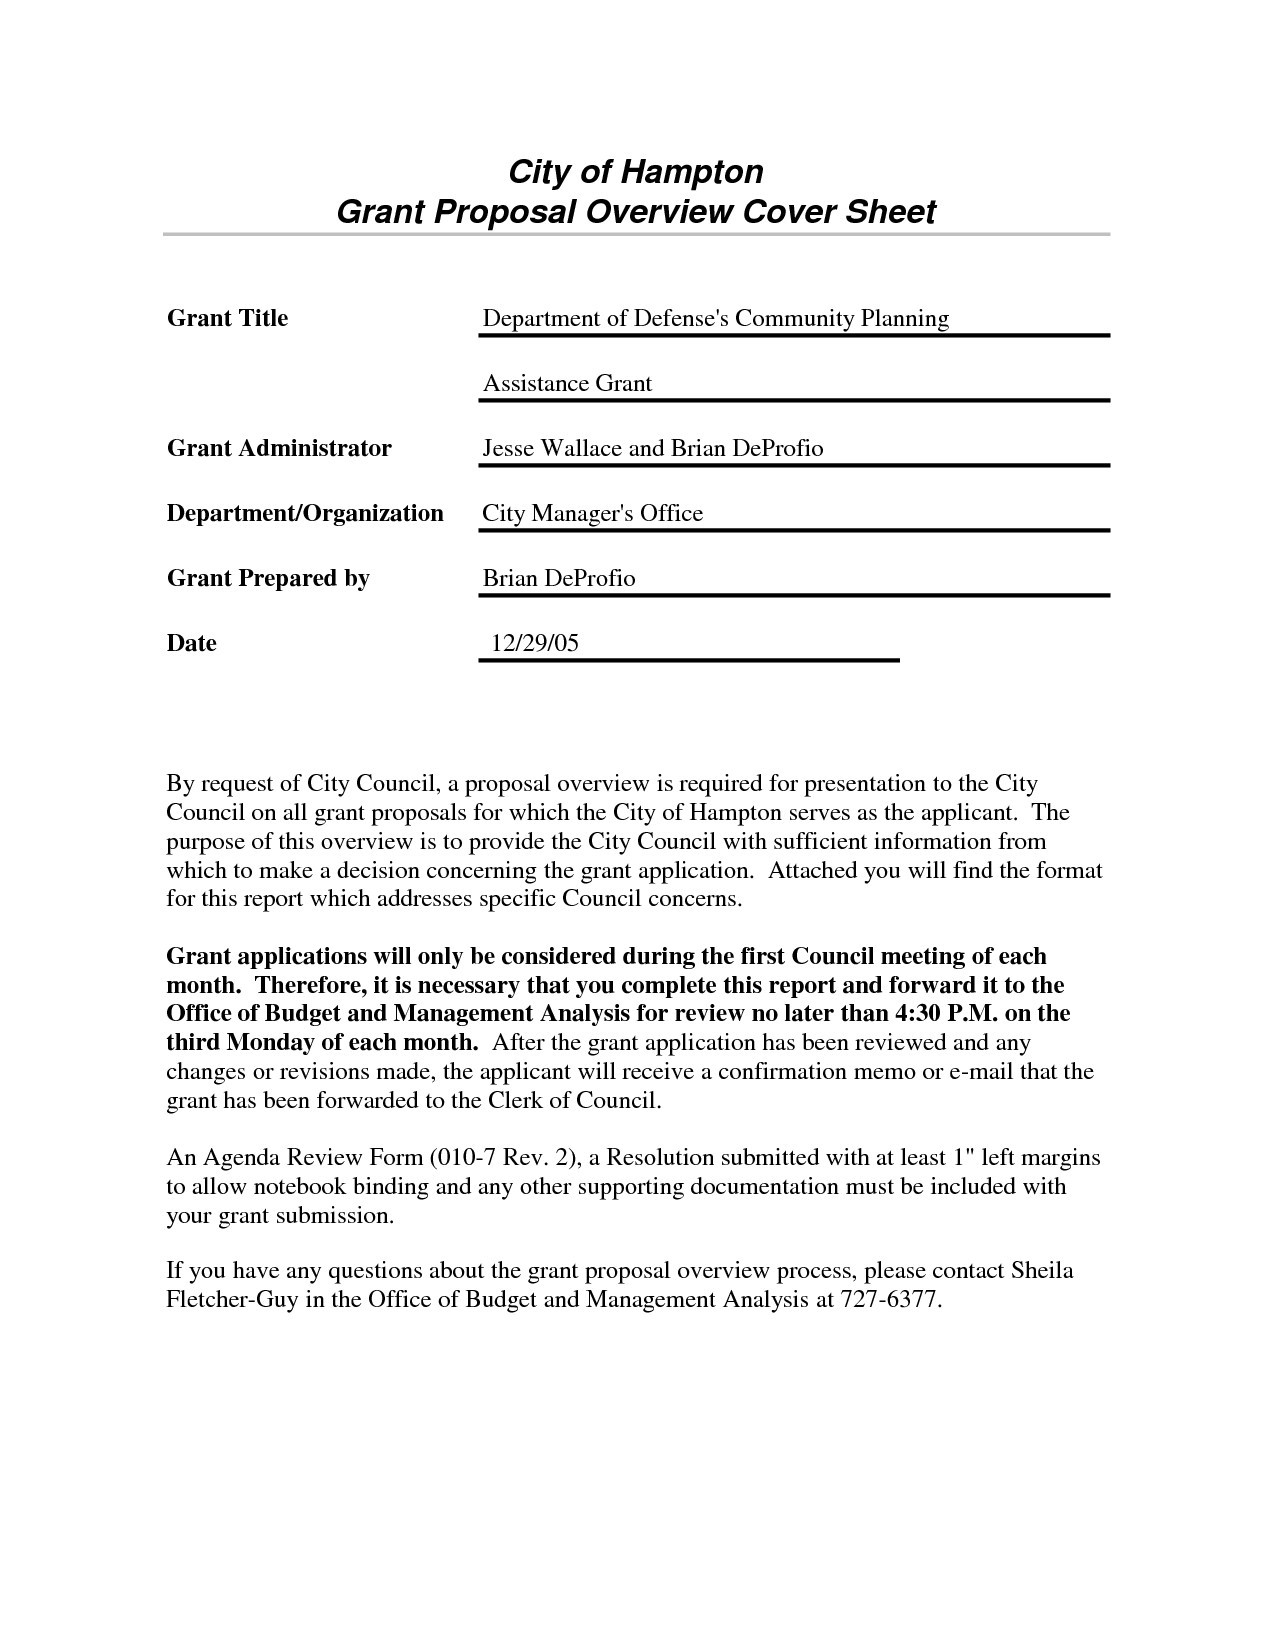 Grant Cover Letter Template - Inspiration Cover Letter for Grant Application Sample